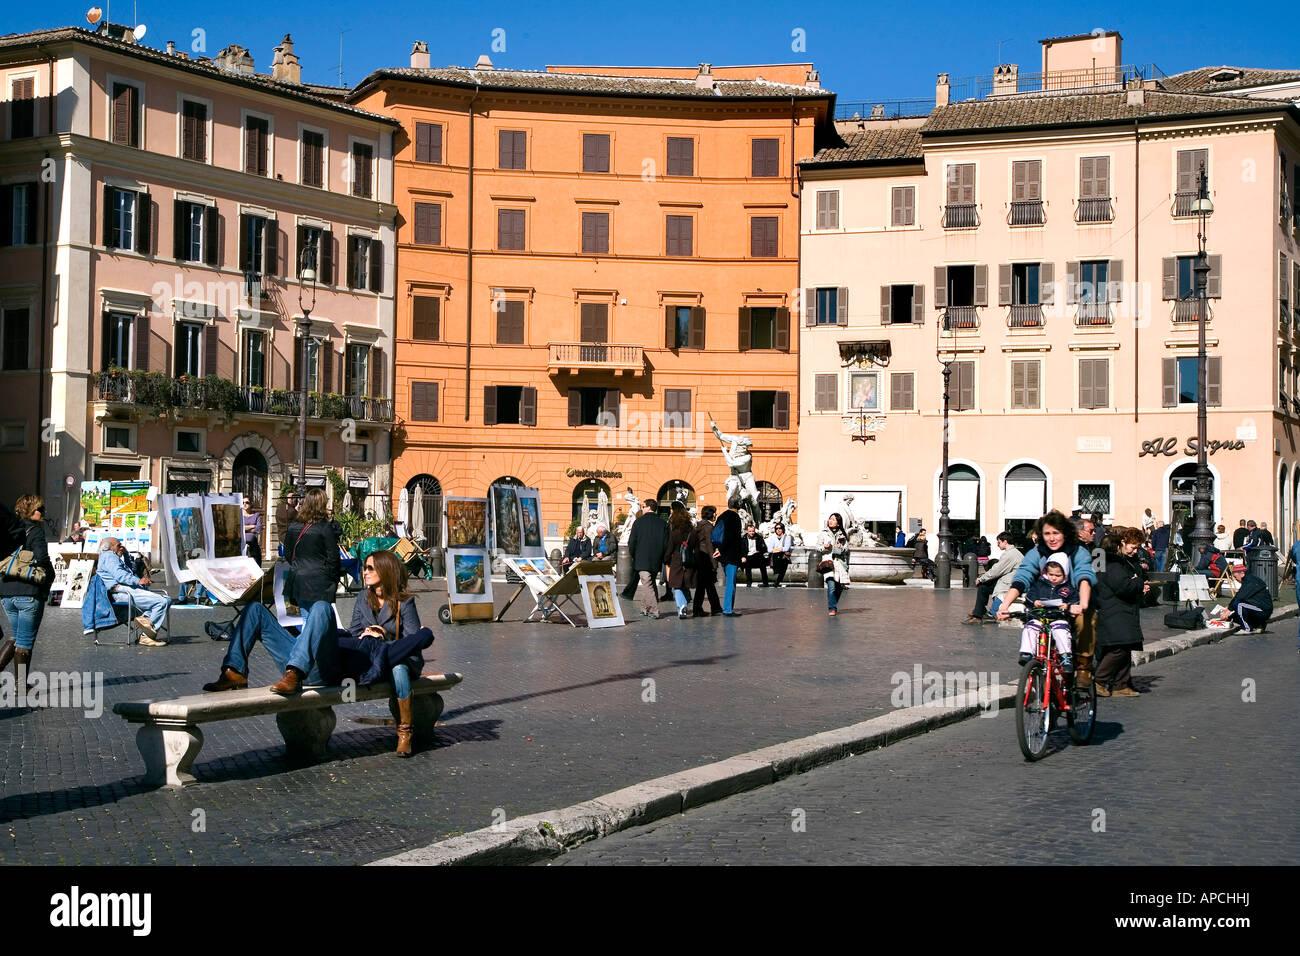 Piazza Navona, Rome, Latium, Italy Stock Photo